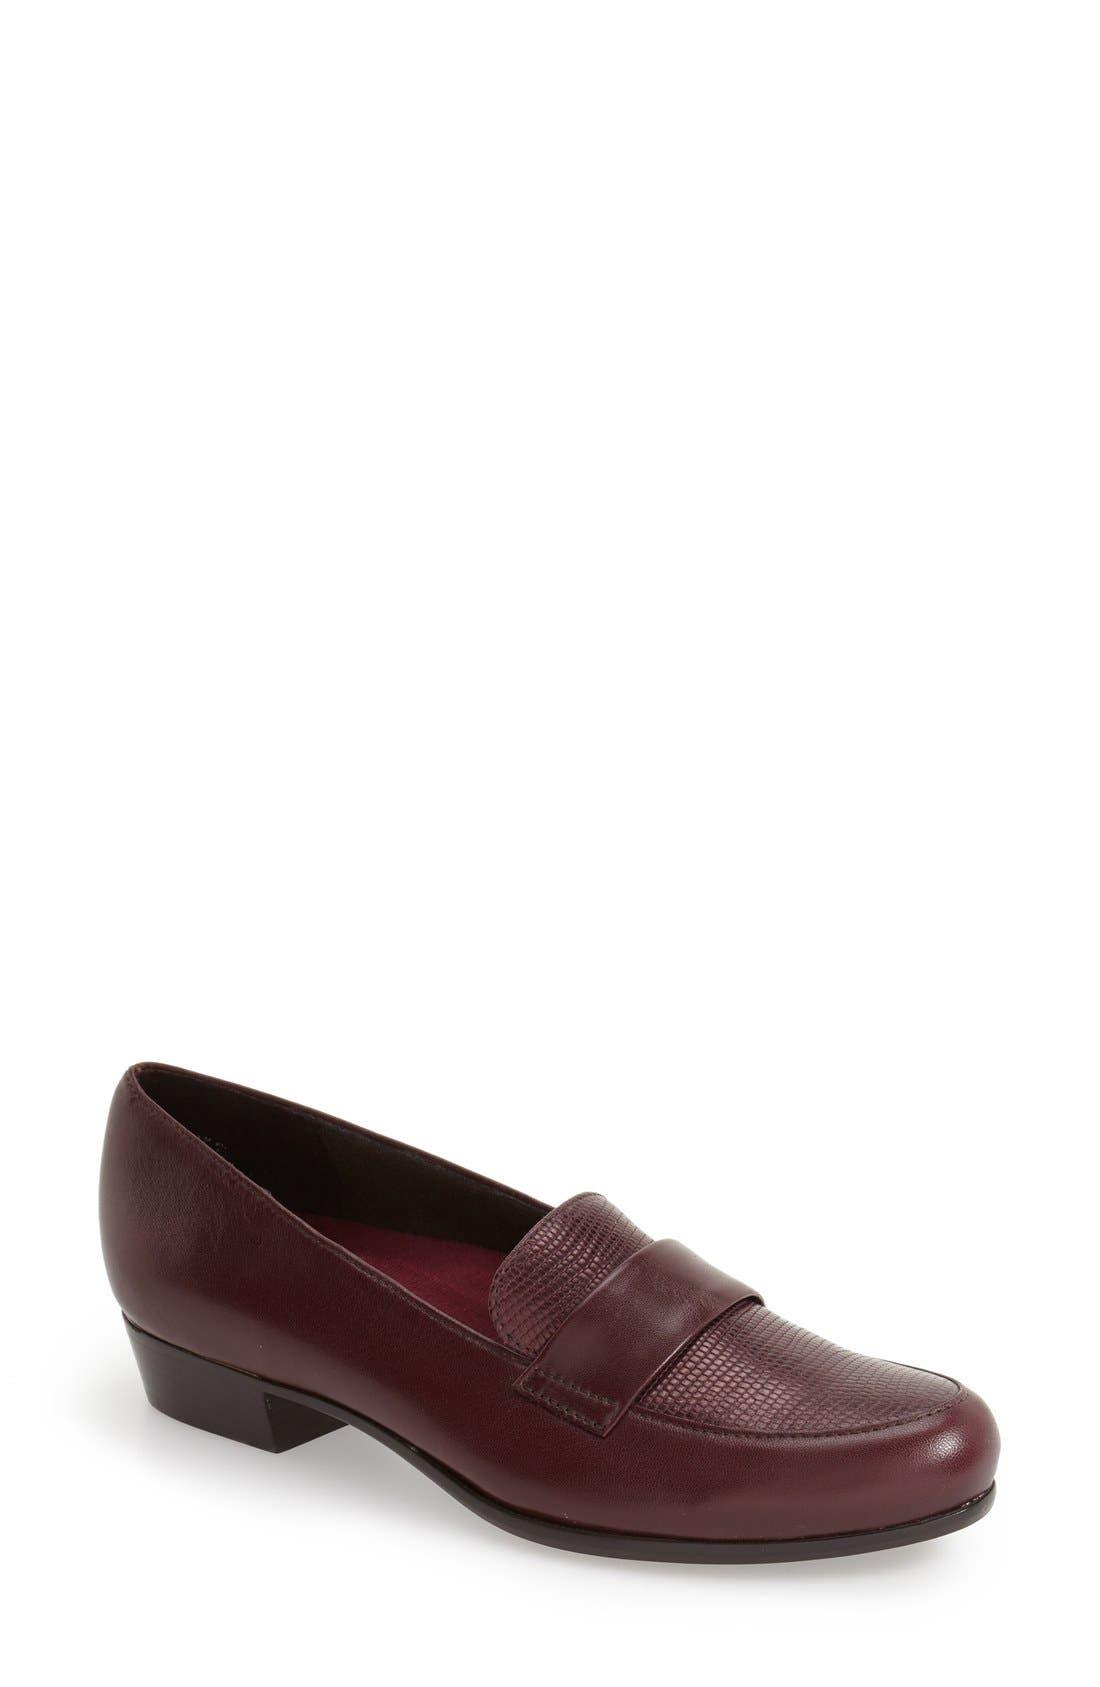 'Kiera' Loafer,                         Main,                         color, 930